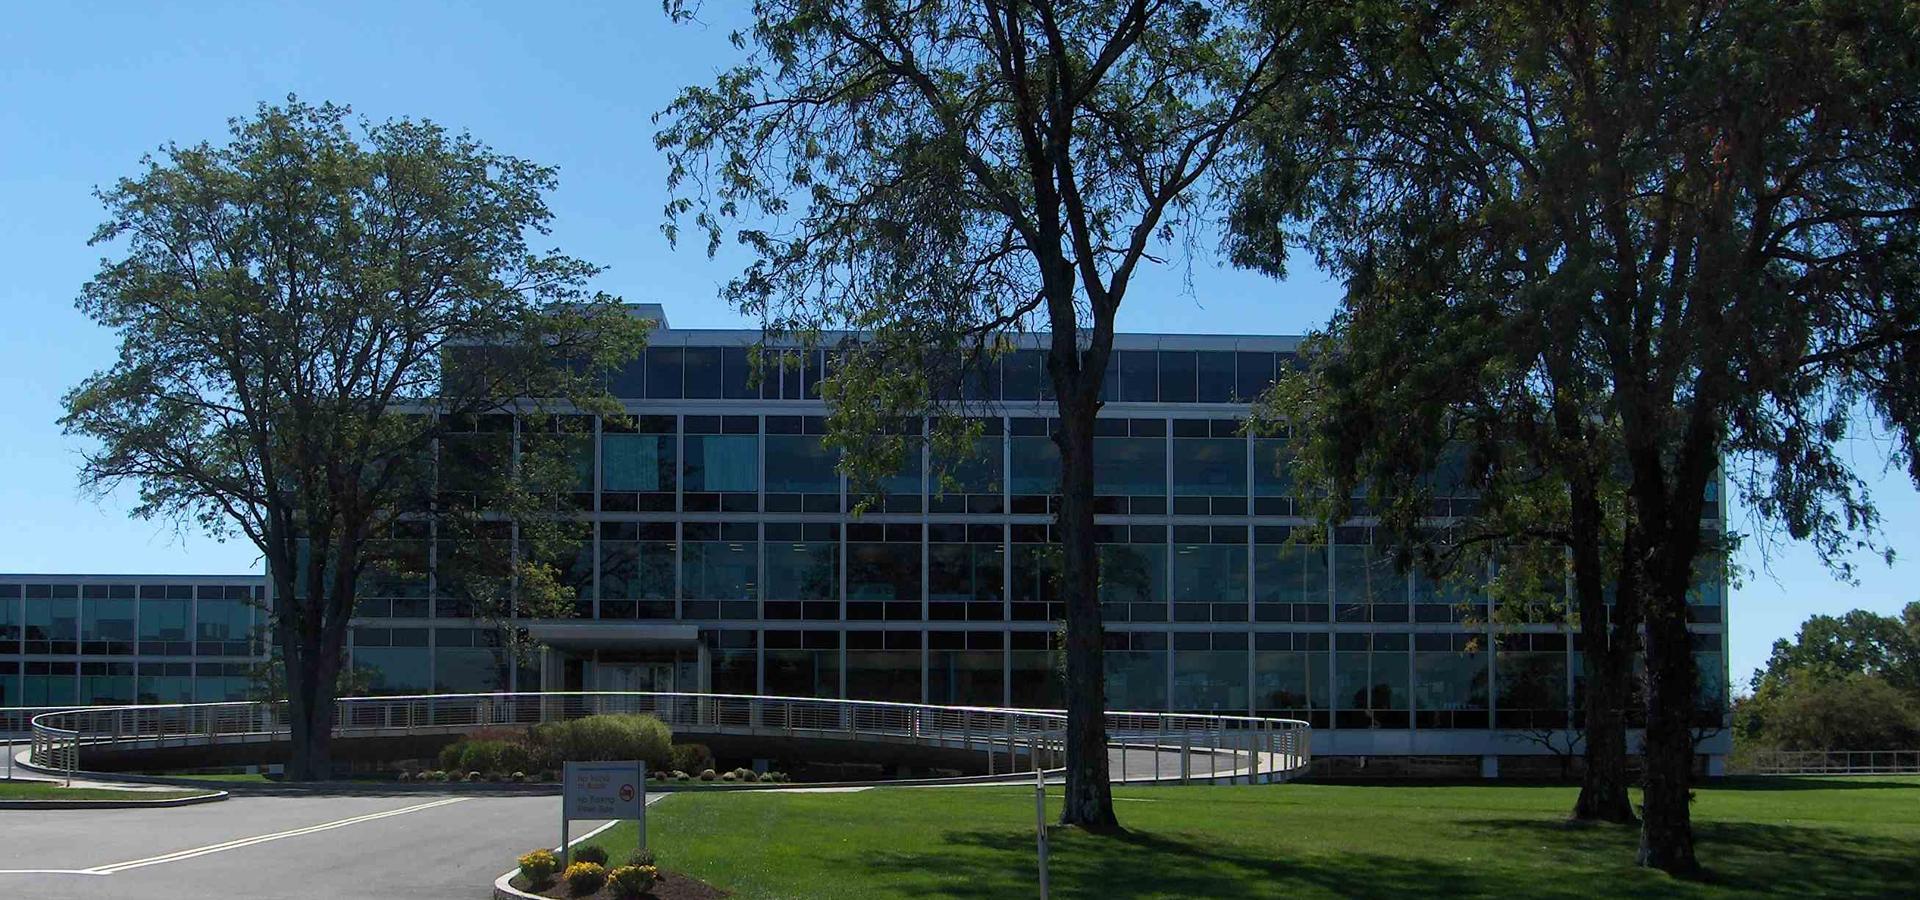 Peer-to-peer advisory in Hartford, Connecticut, USA